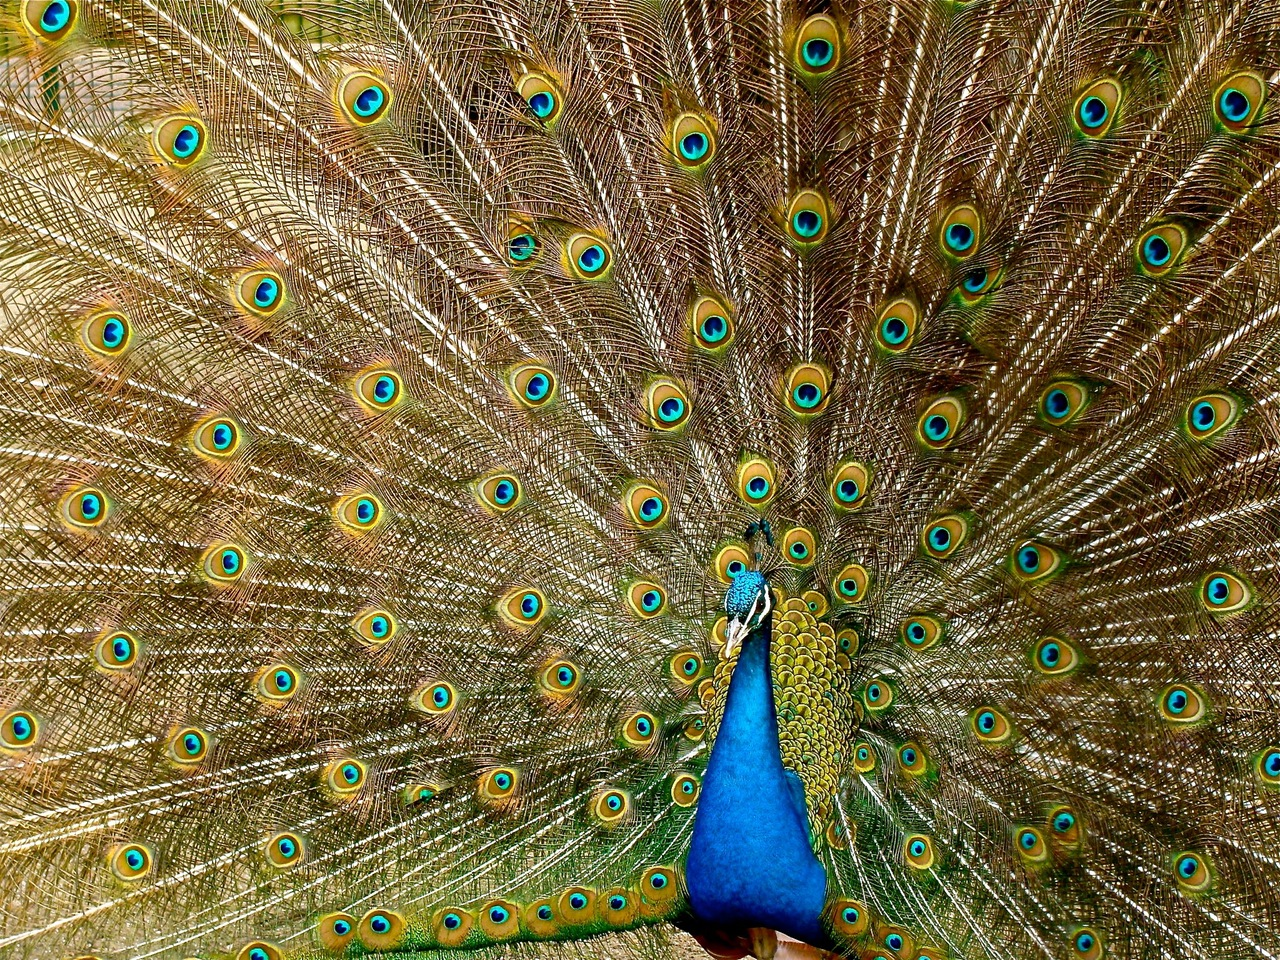 peacock-plumage-bird-peafowl-45911.jpeg